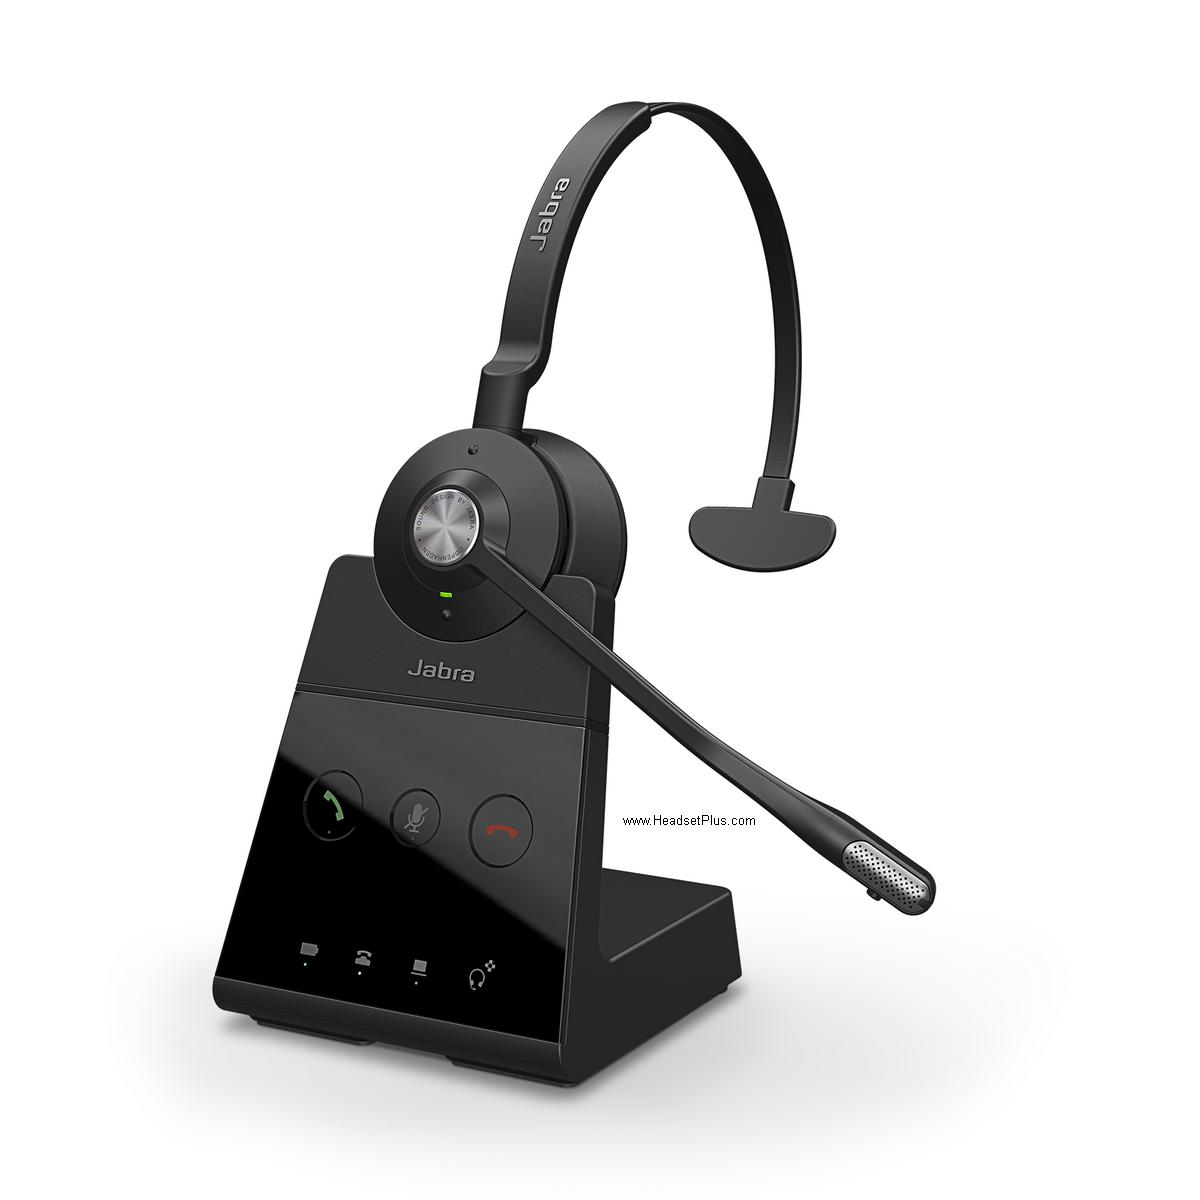 HeadsetPlus.com Plantronics, Jabra Headset